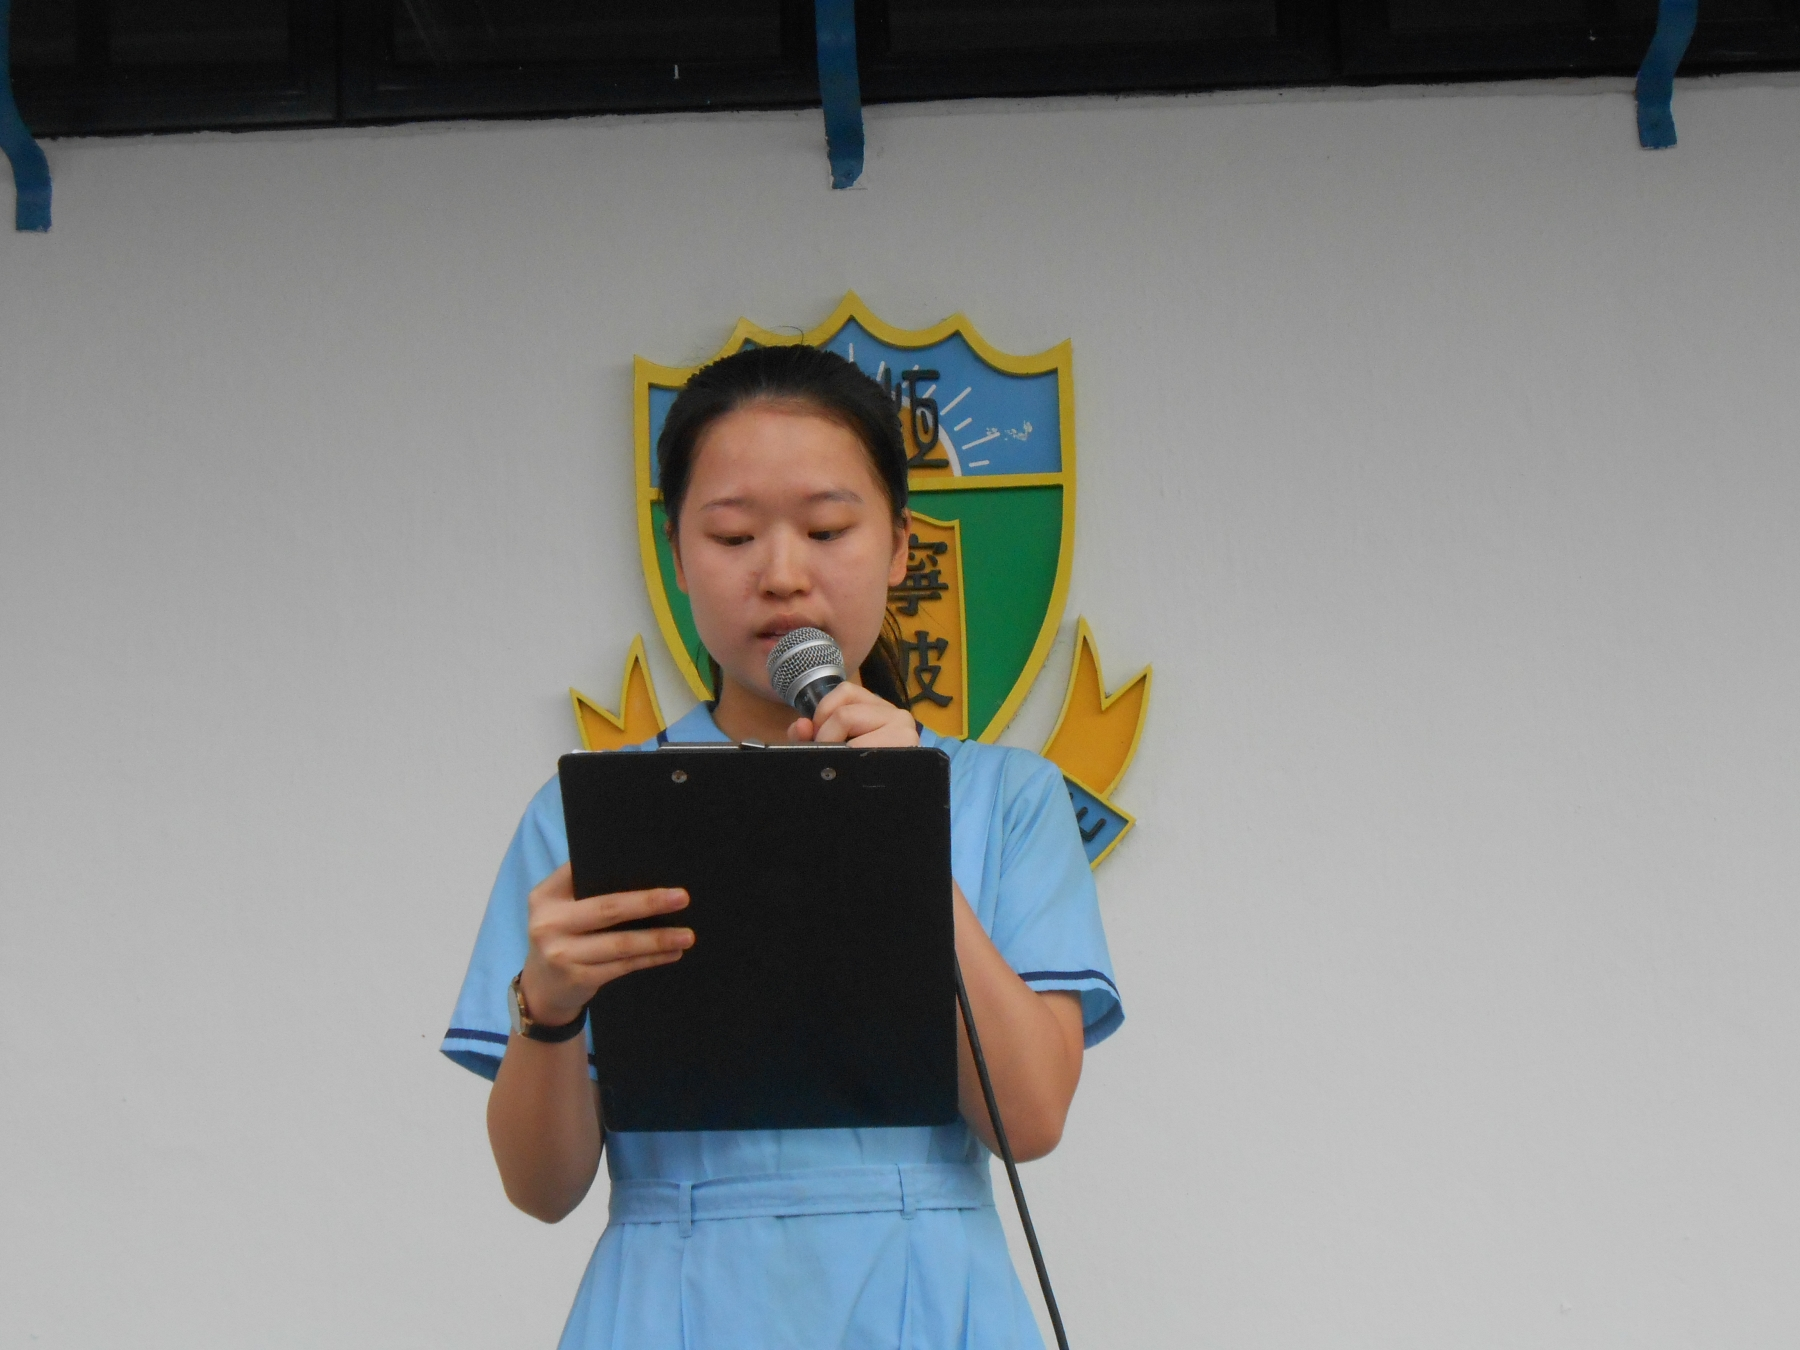 http://npc.edu.hk/sites/default/files/dscn2052.jpg